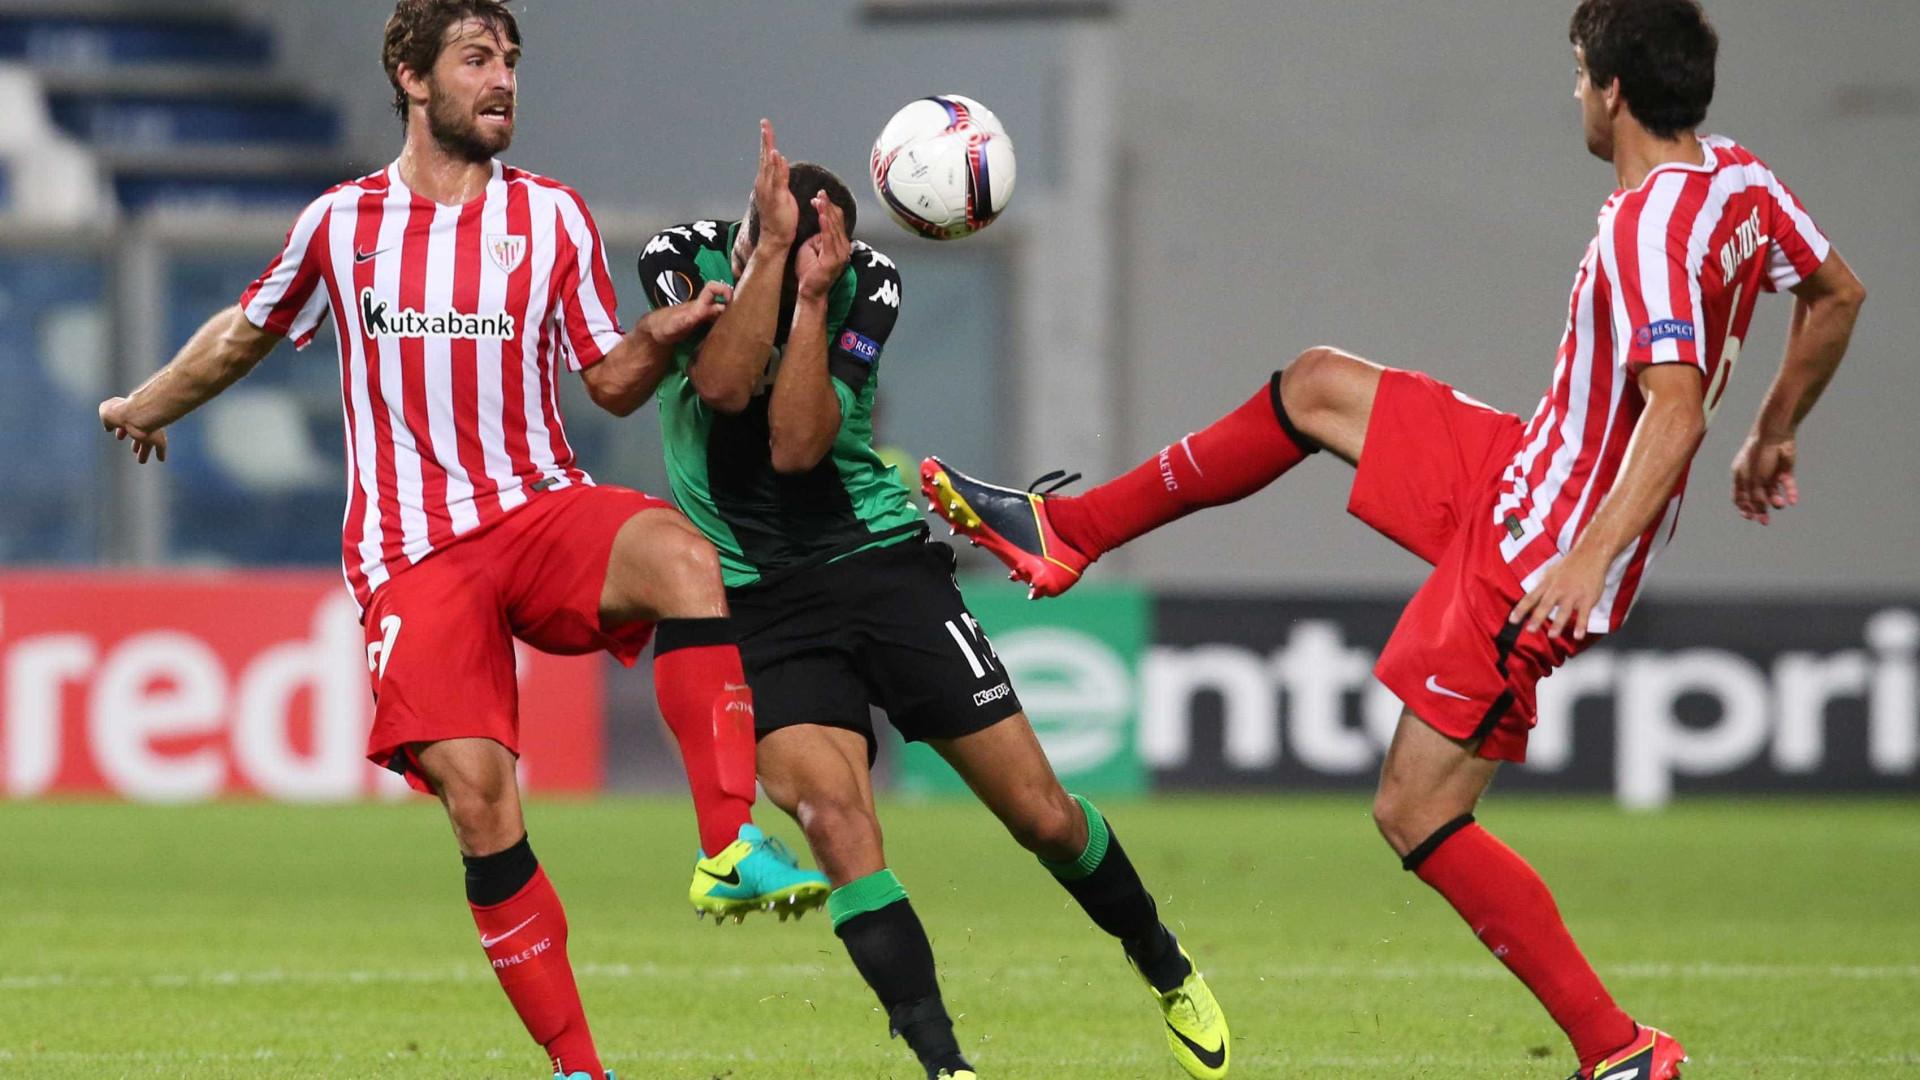 Yeray Álvarez vence novamente o cancro e volta ao Atlético Bilbao